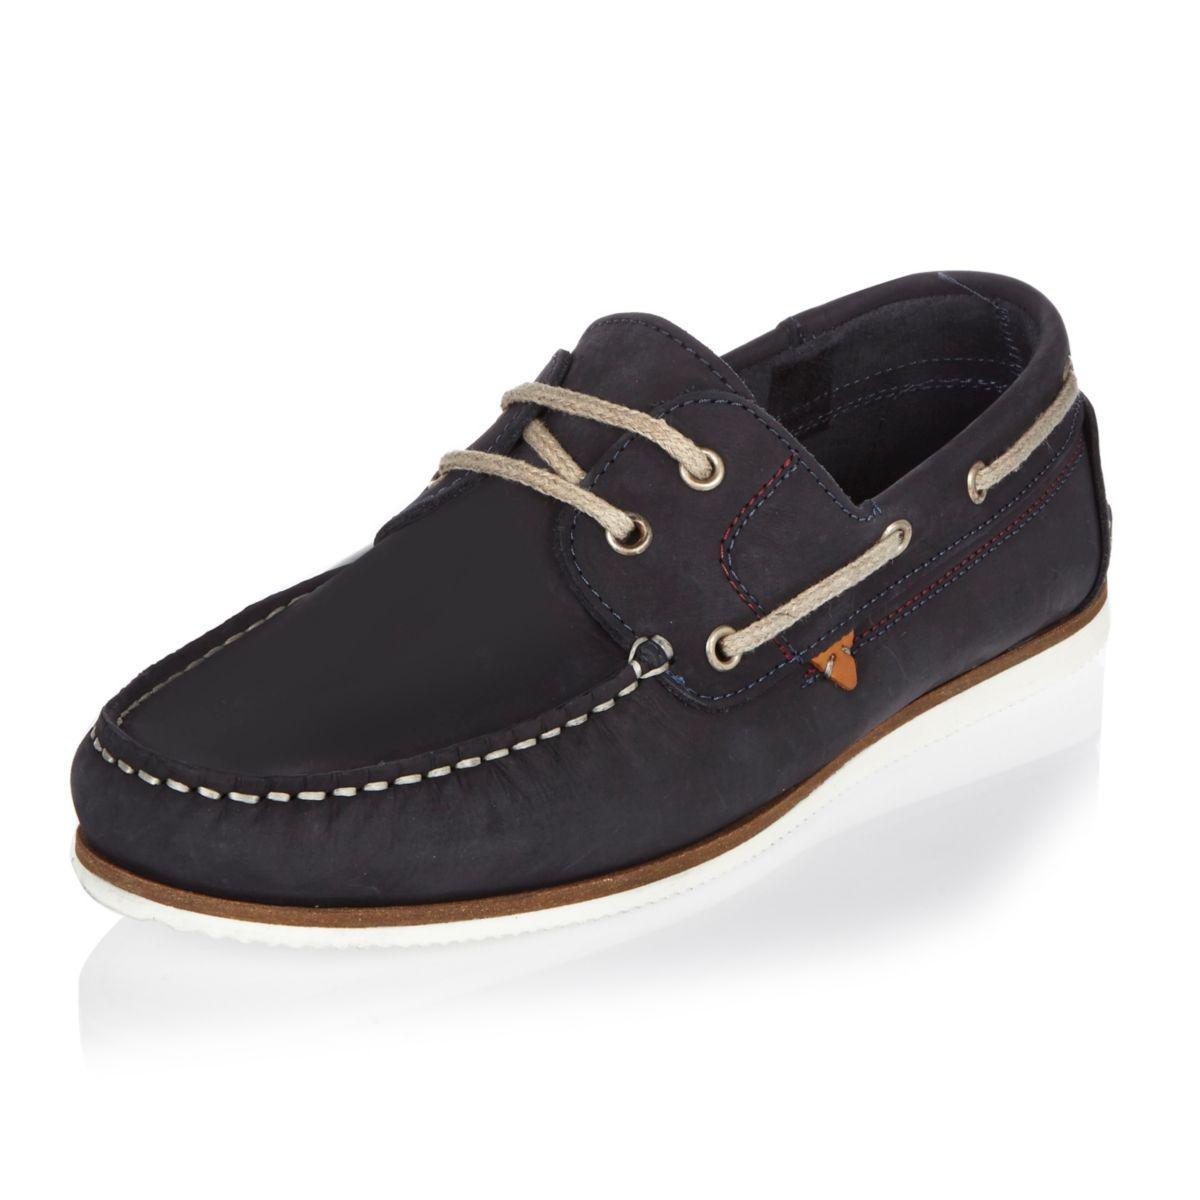 Men's Navy Blue Nubuck Boat Shoes